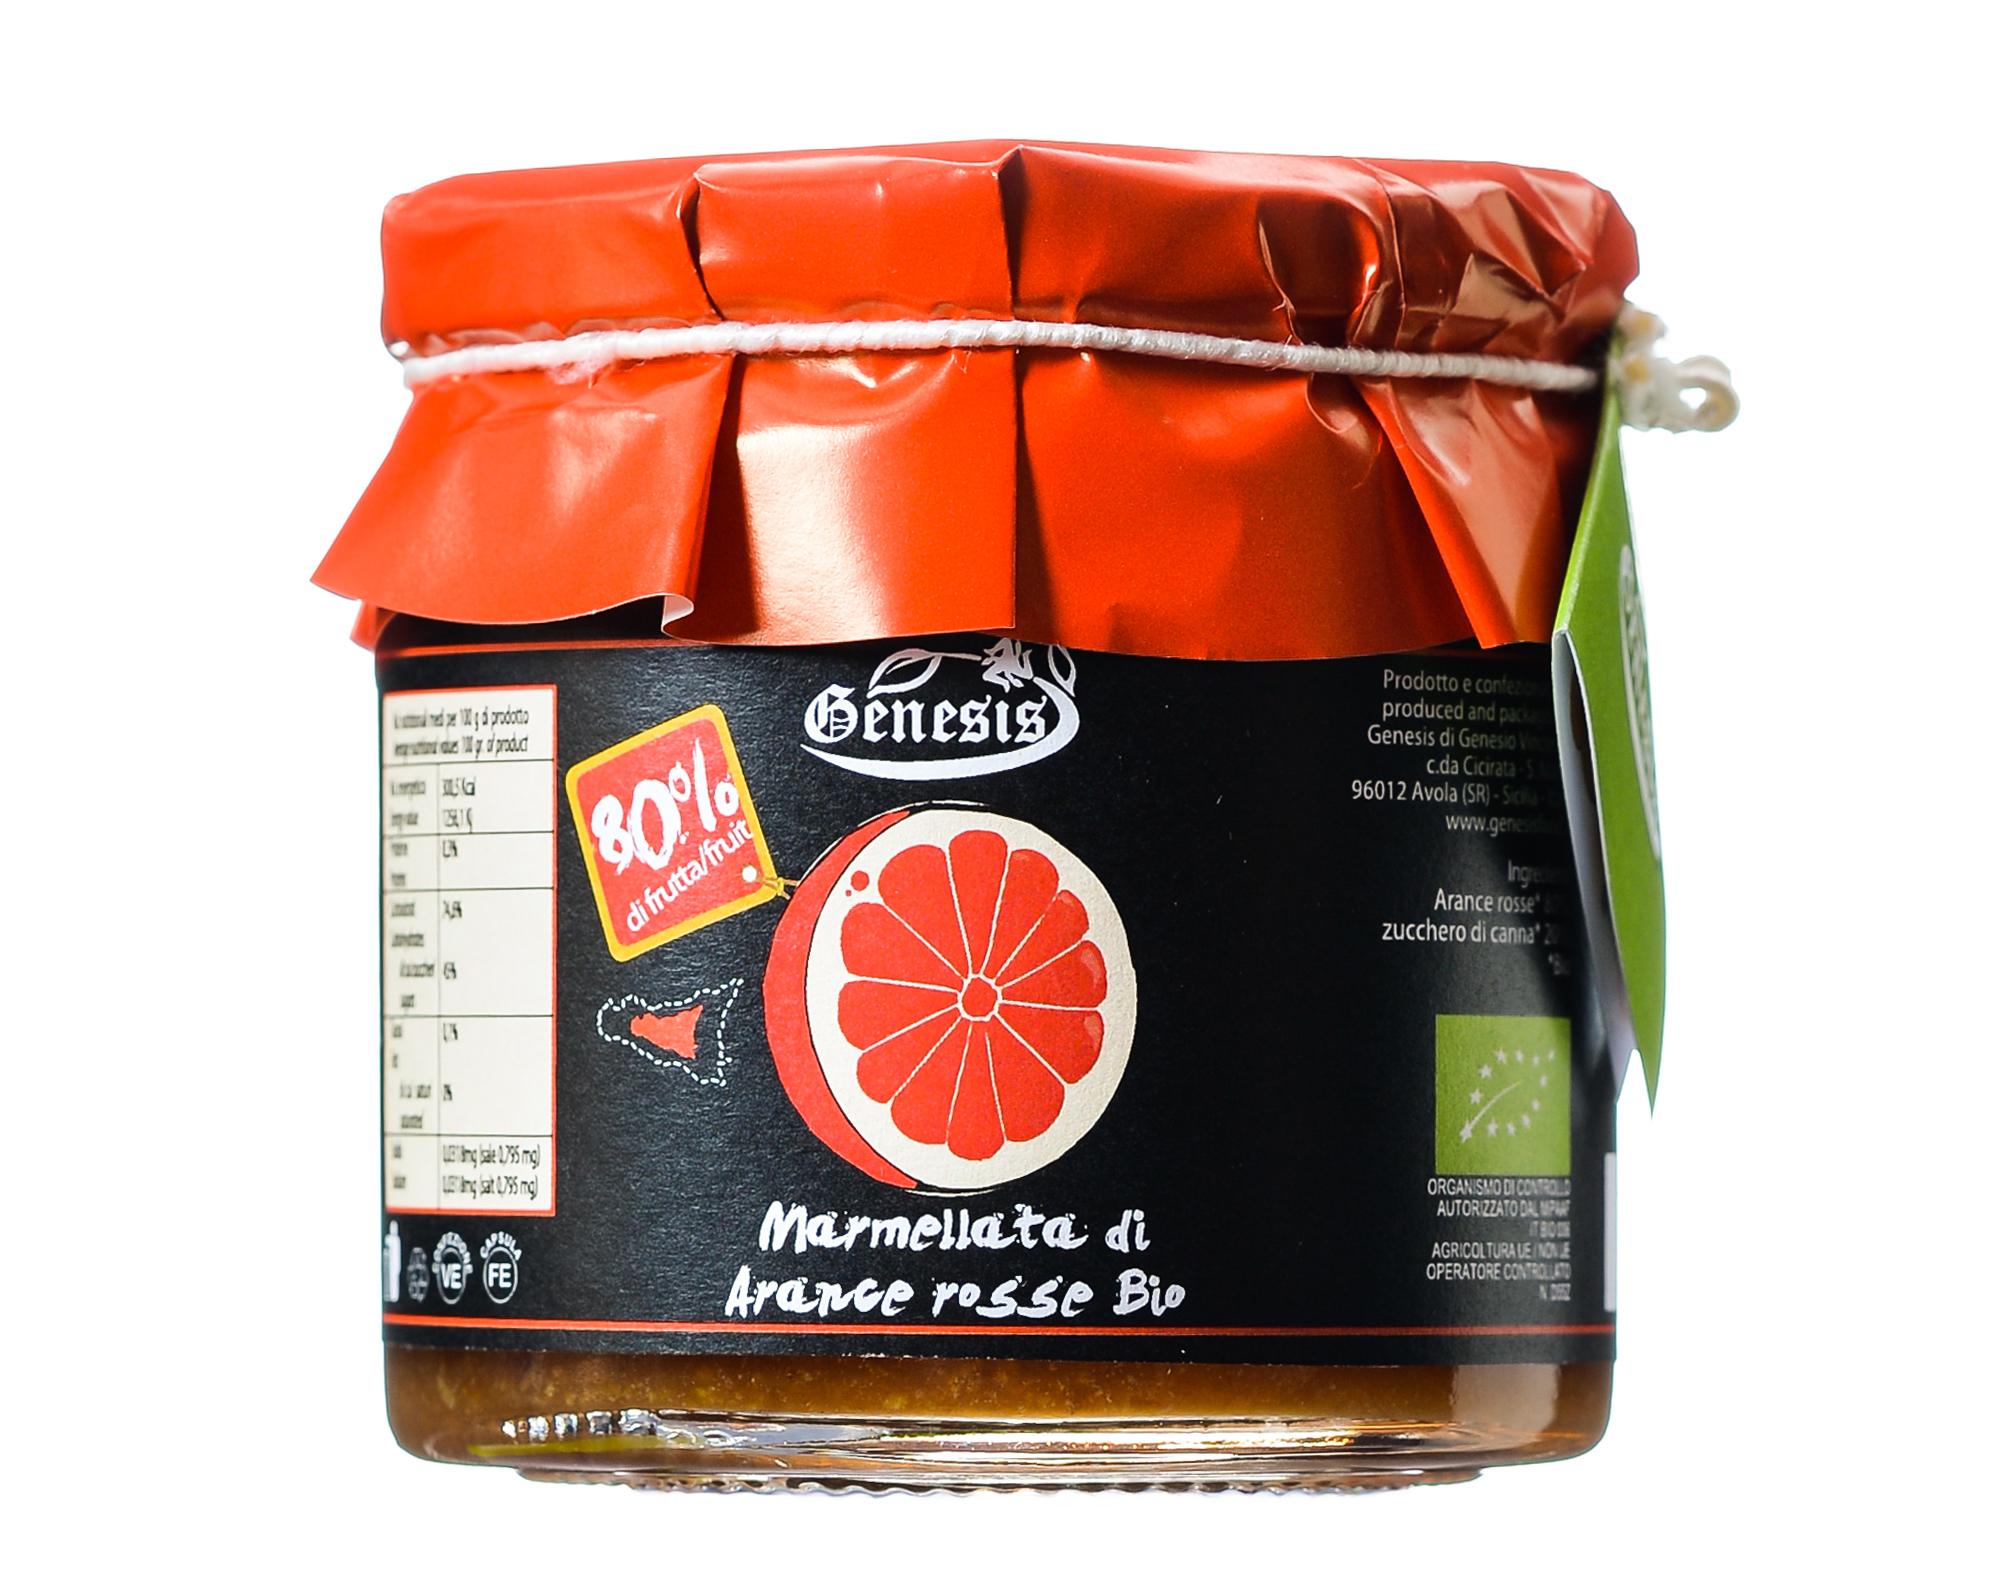 Marmellata di arancia rosse Bio ブラッドオレンジジャム(タロッコ種)